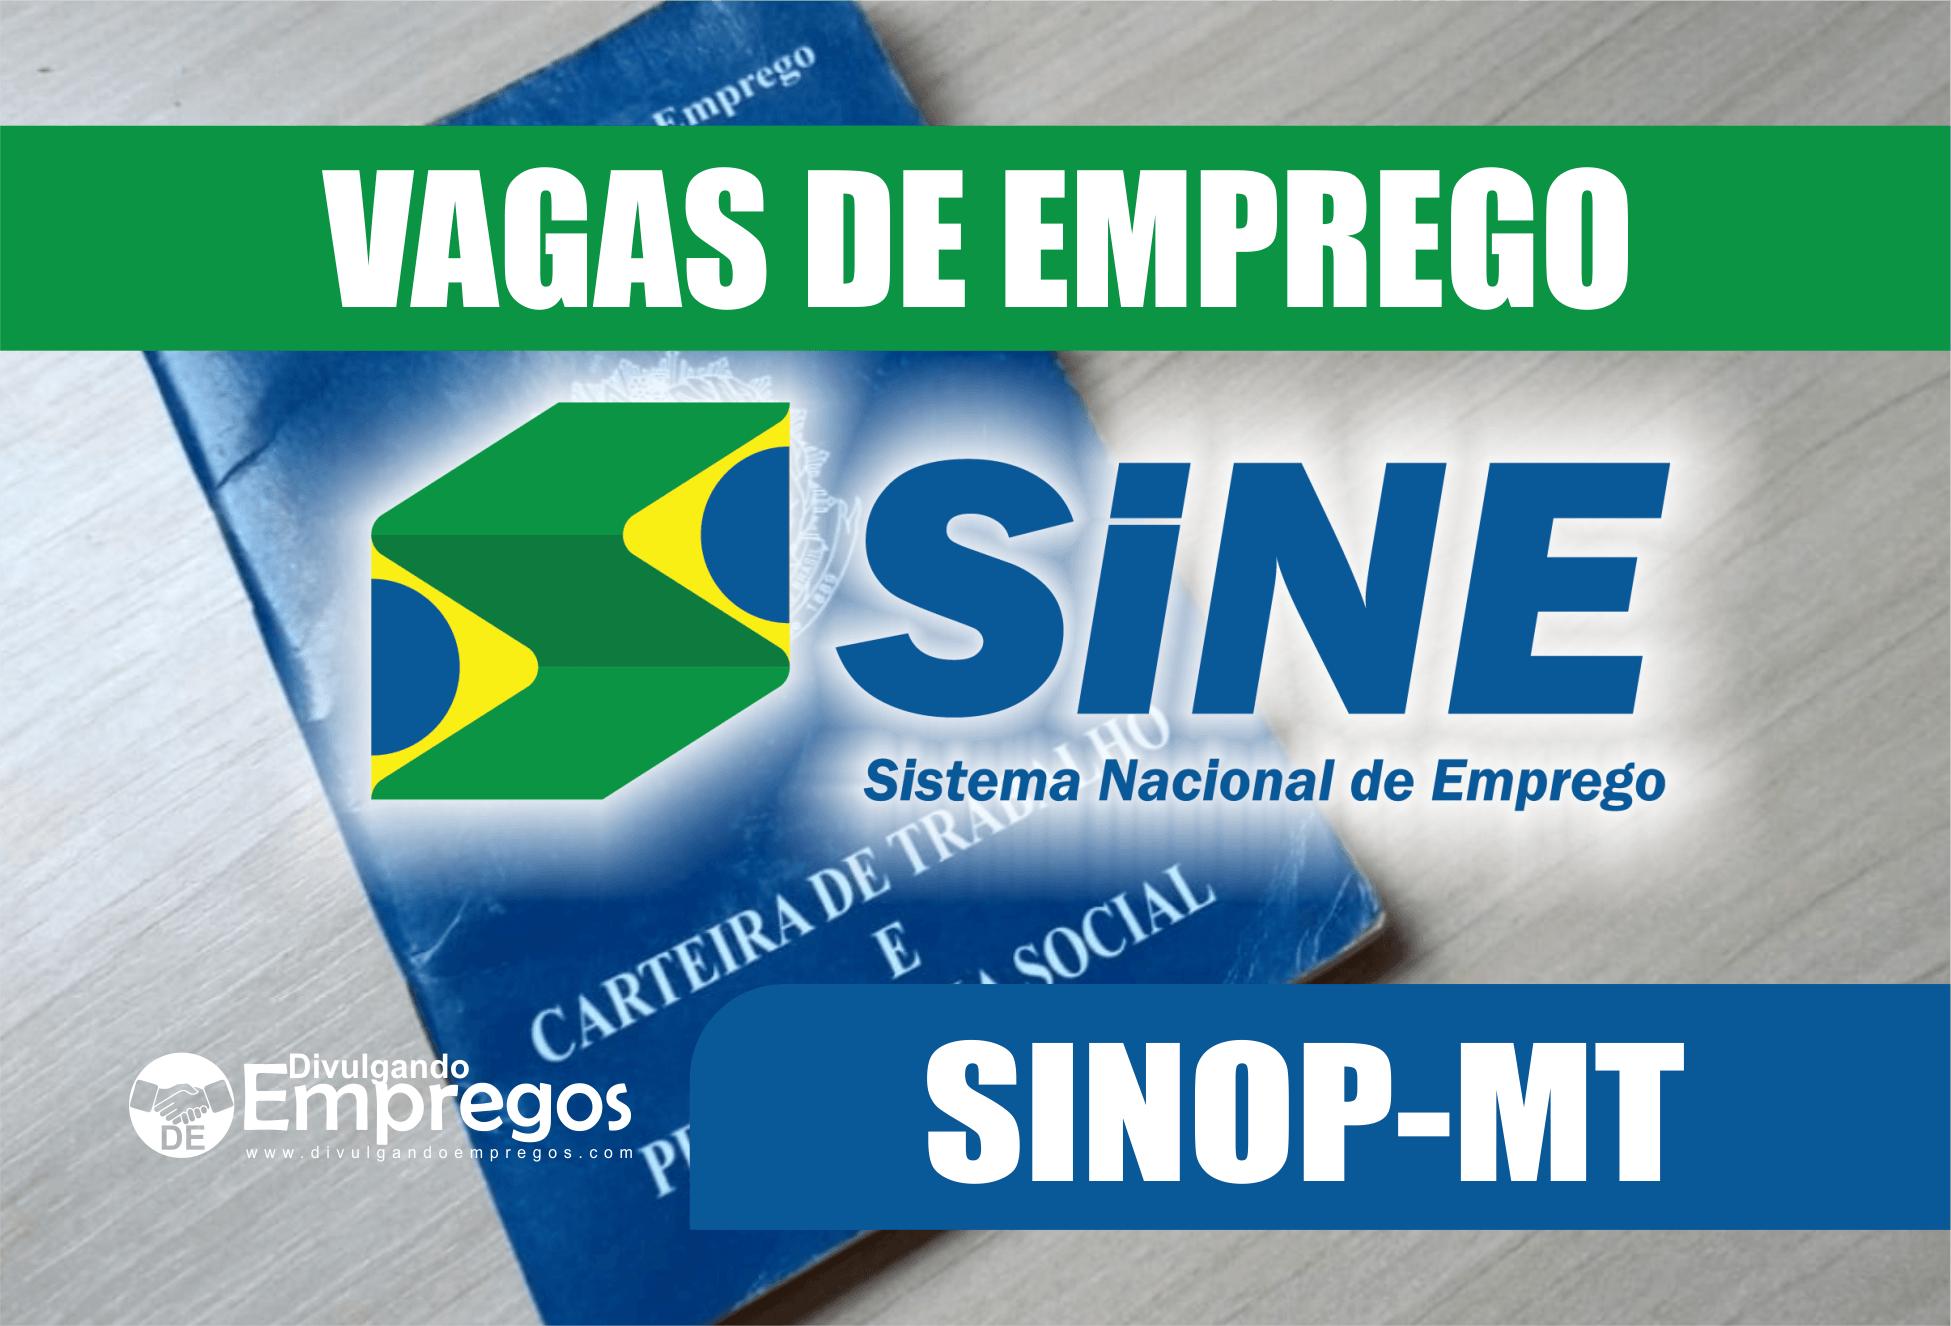 339 Vagas de Emprego no SINE de Sinop nesta quinta-feira (13/06)